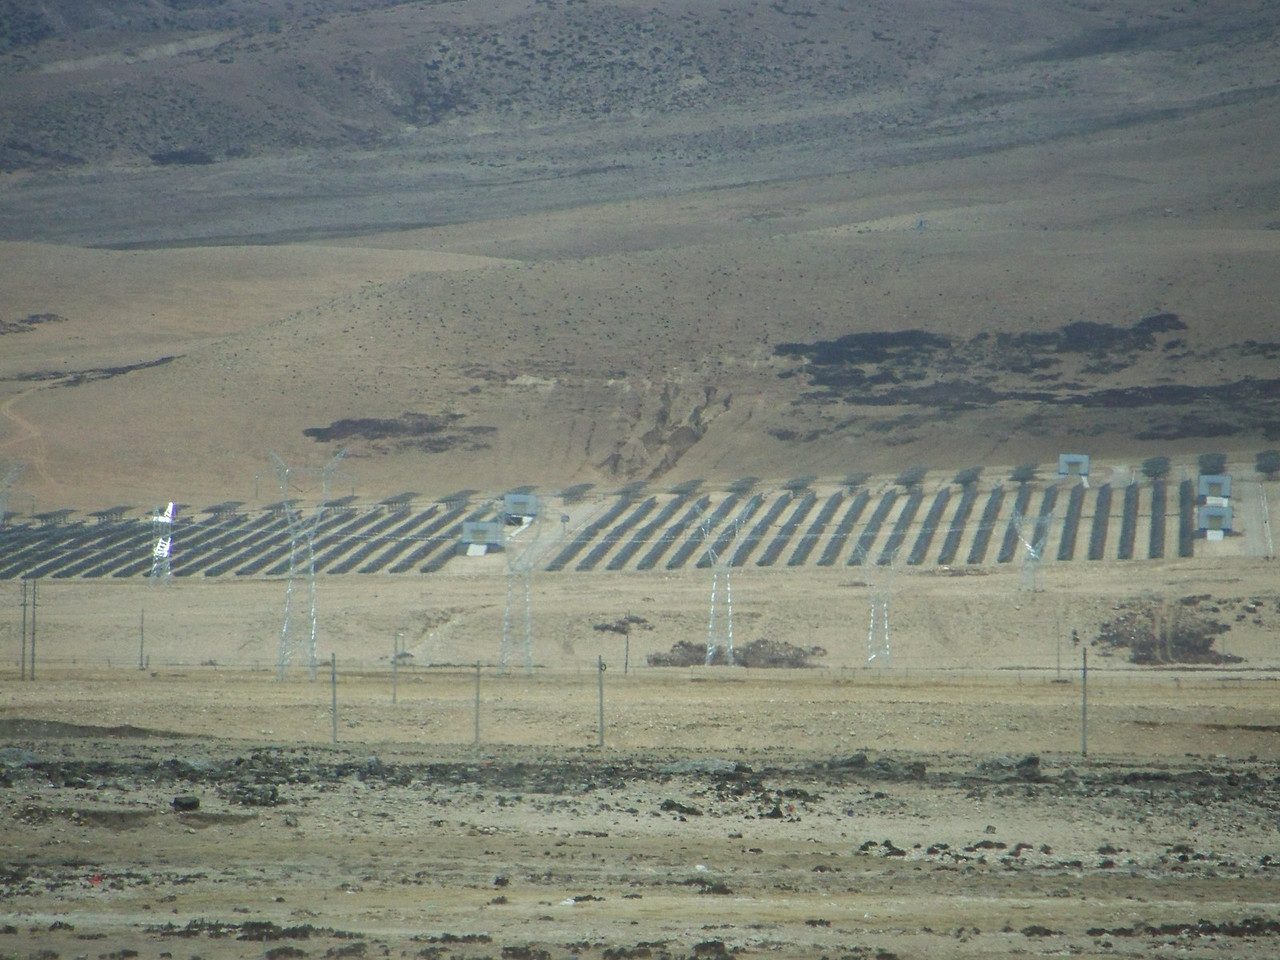 0123 - Solar Panels near Lhasa on Train Trip Between Beijing and Lhasa.JPG